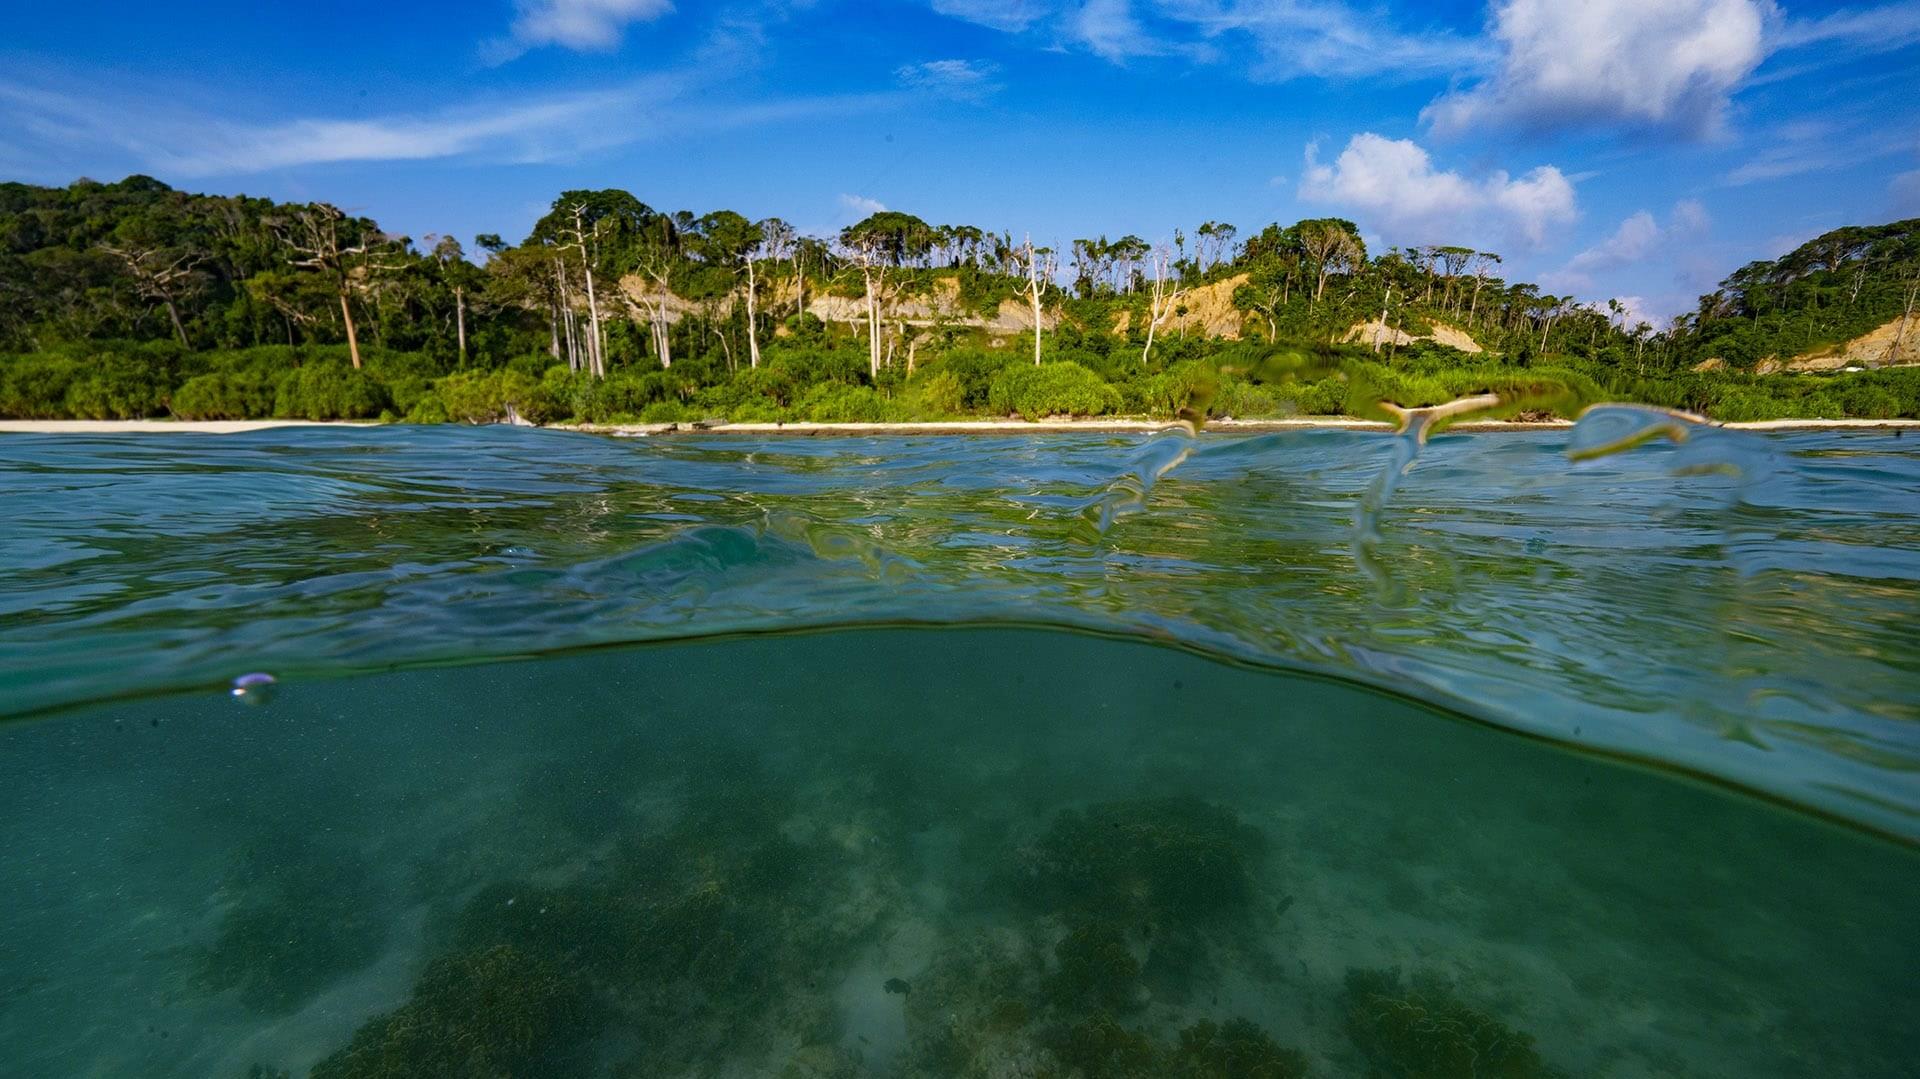 Galathea: A Threatened Paradise at the Edge of the World